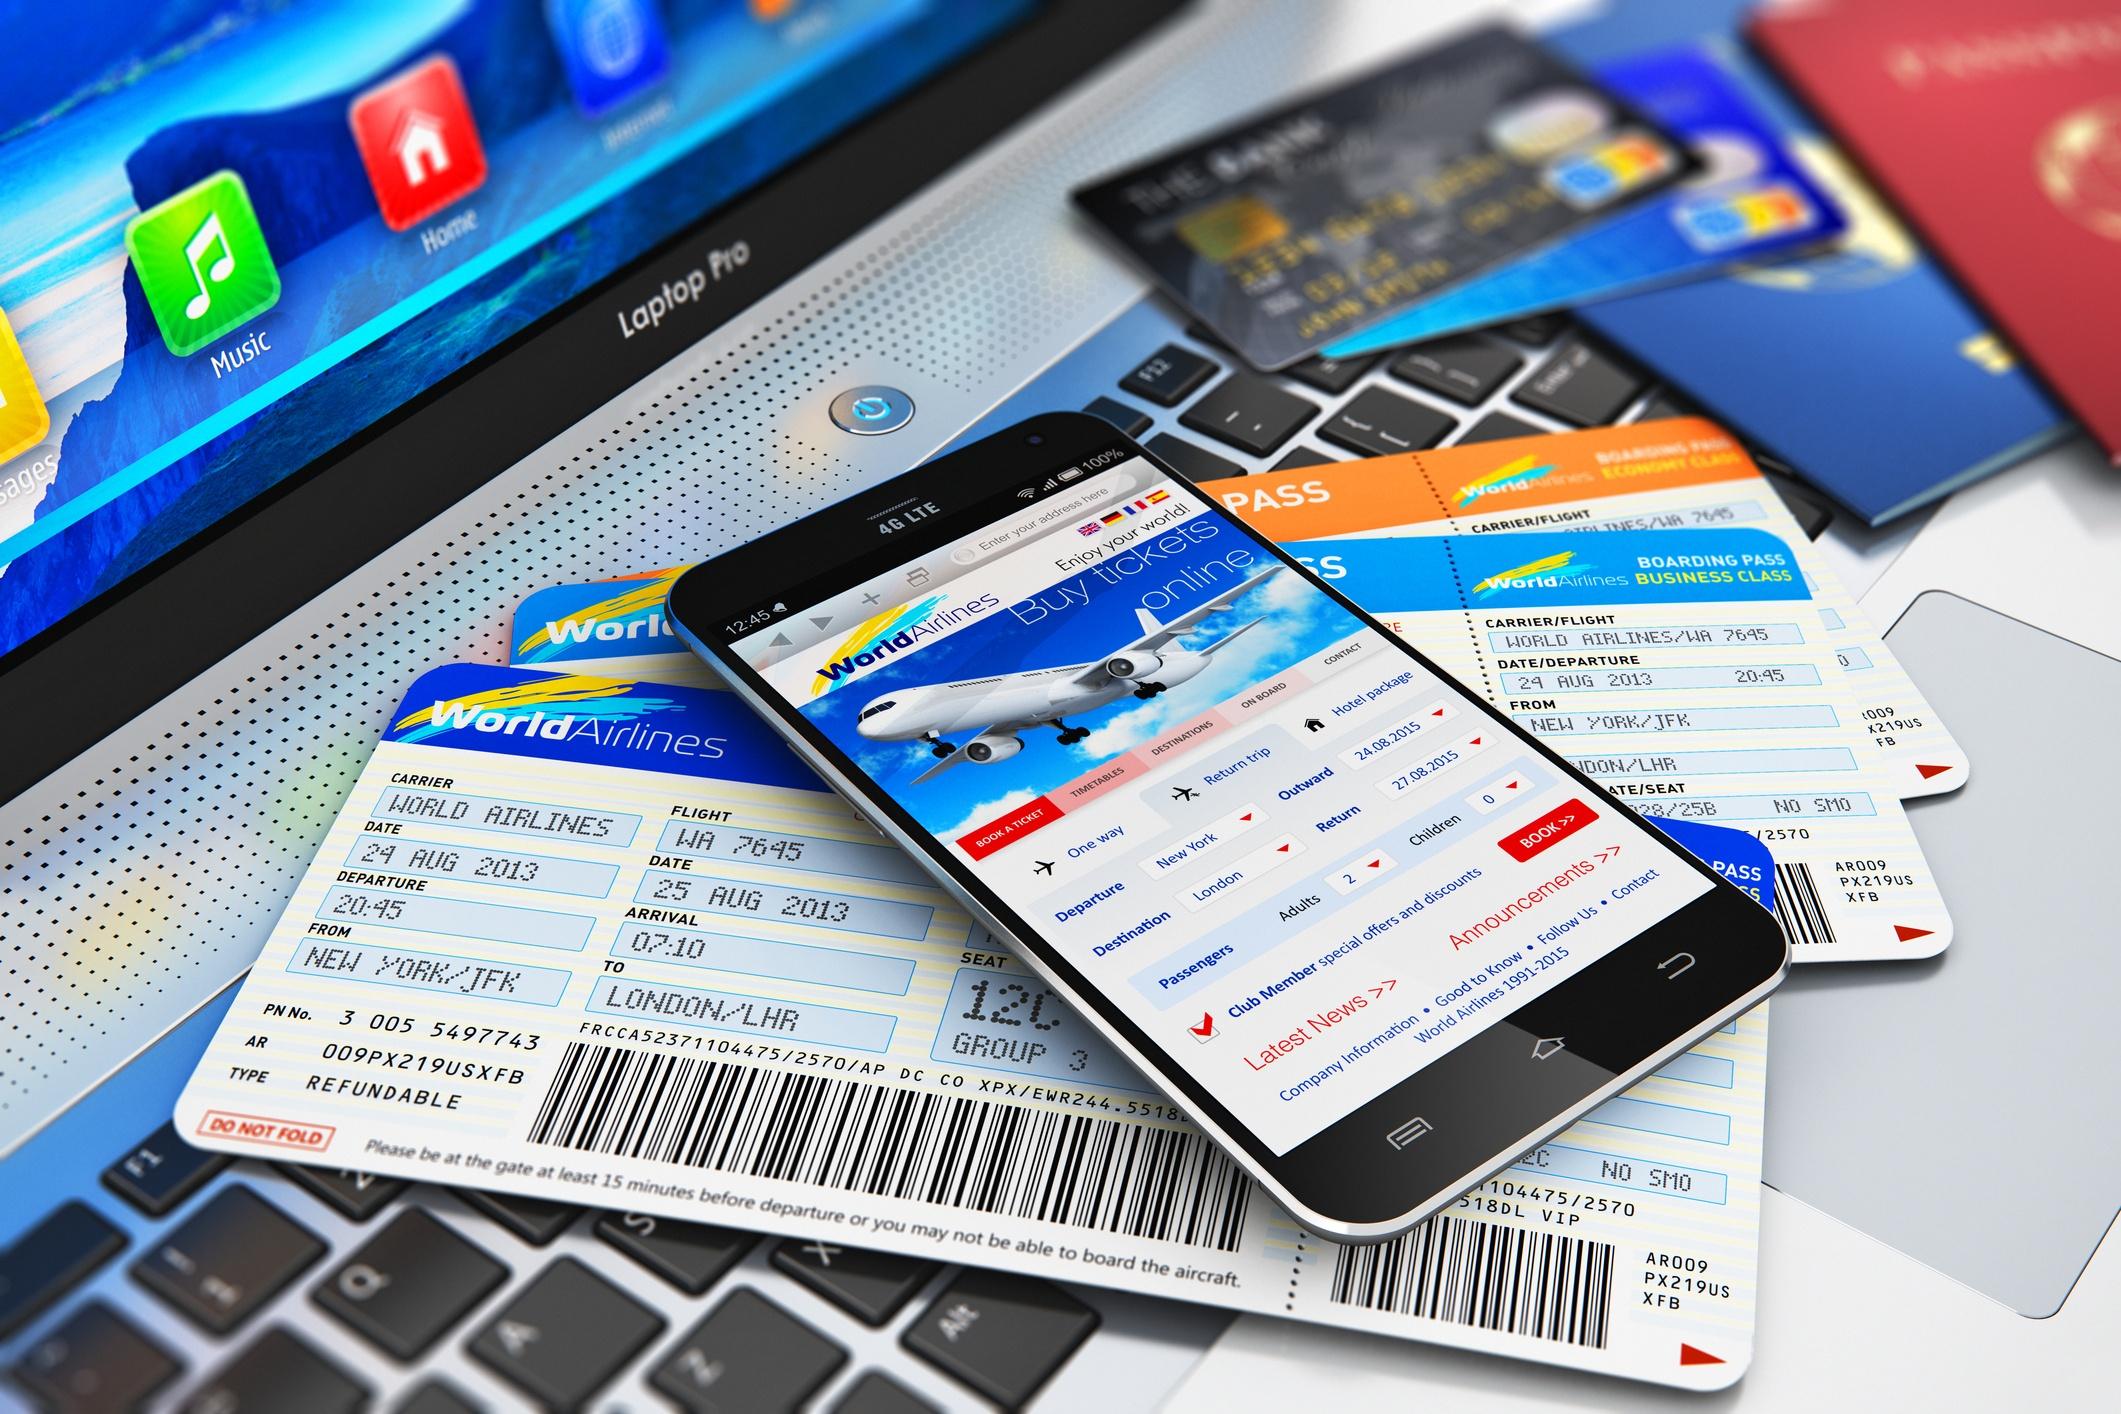 digital travel image.jpg